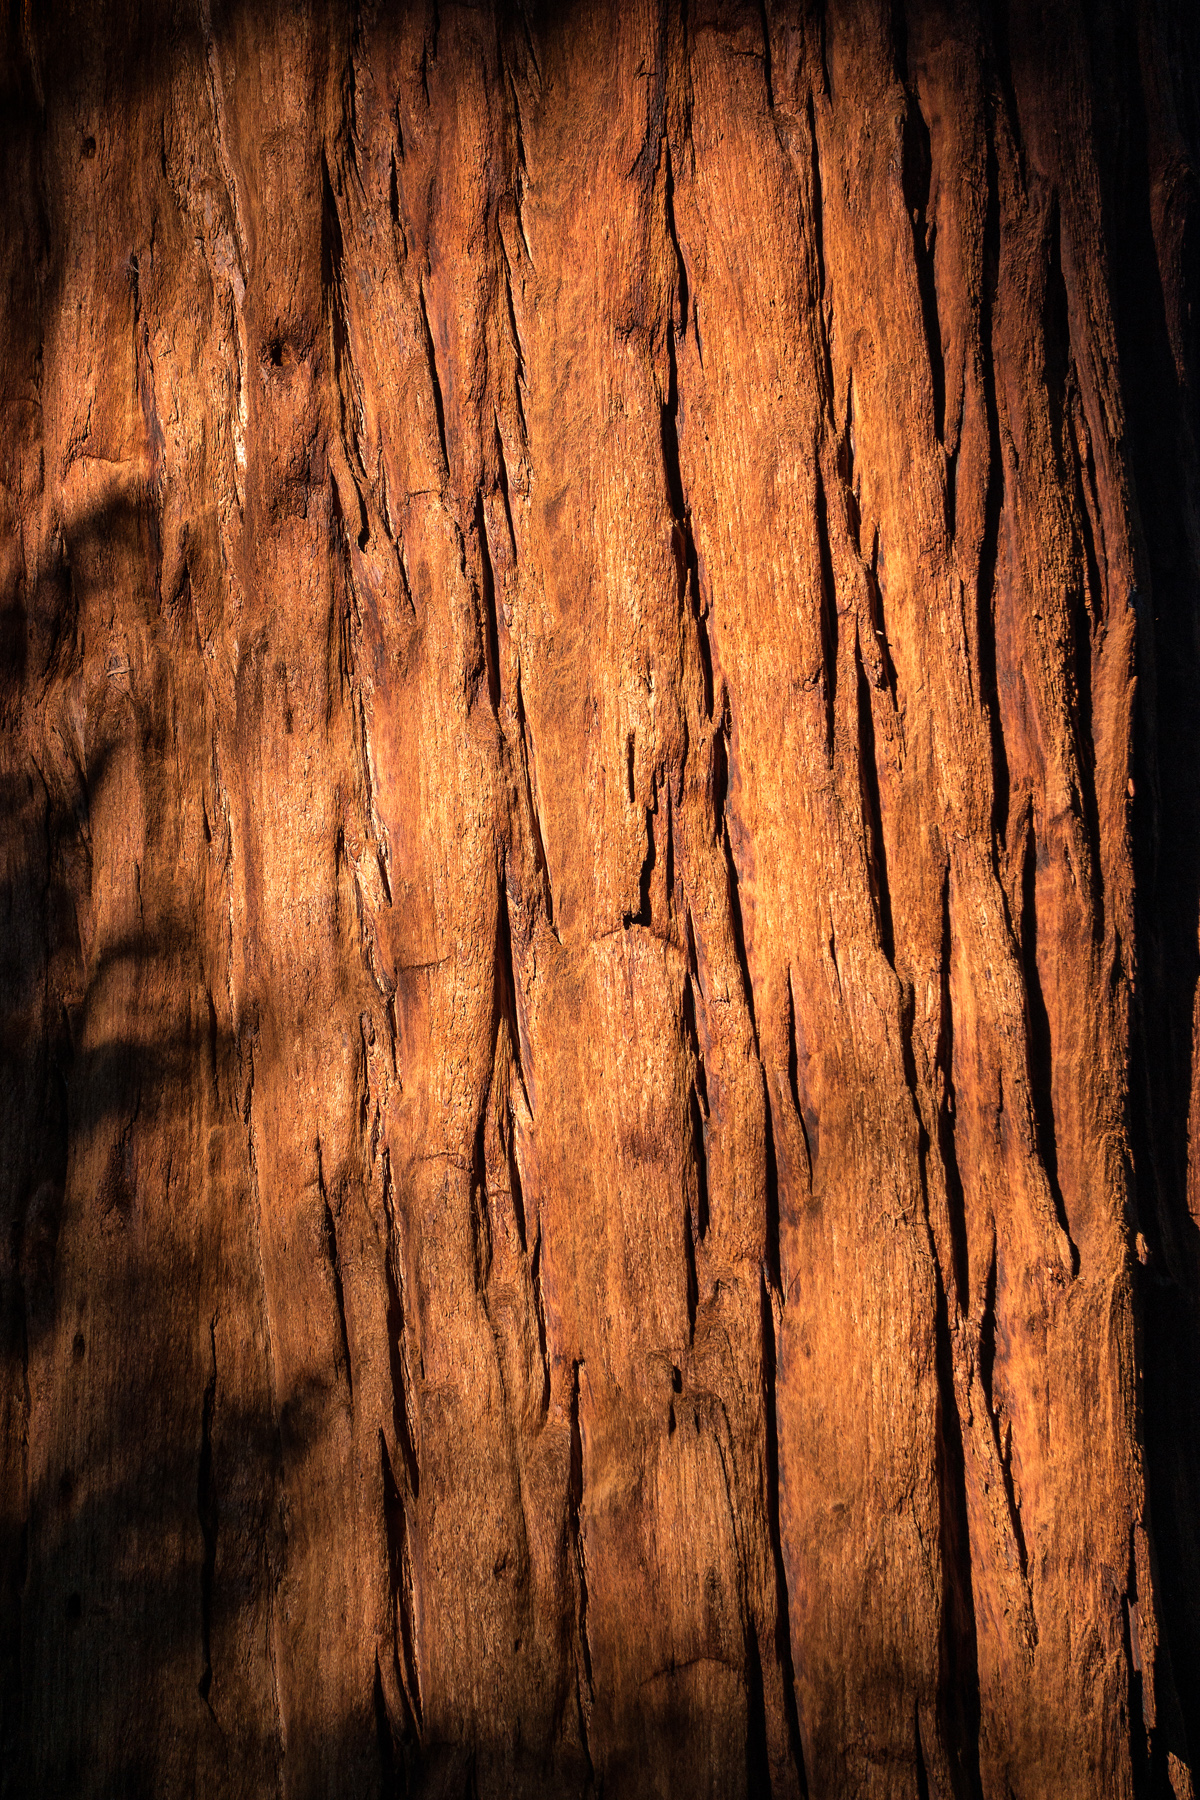 Wasim Muklashy Photography_Sequoia National Park_California_December 2015_-SAM_4064-Edit.jpg